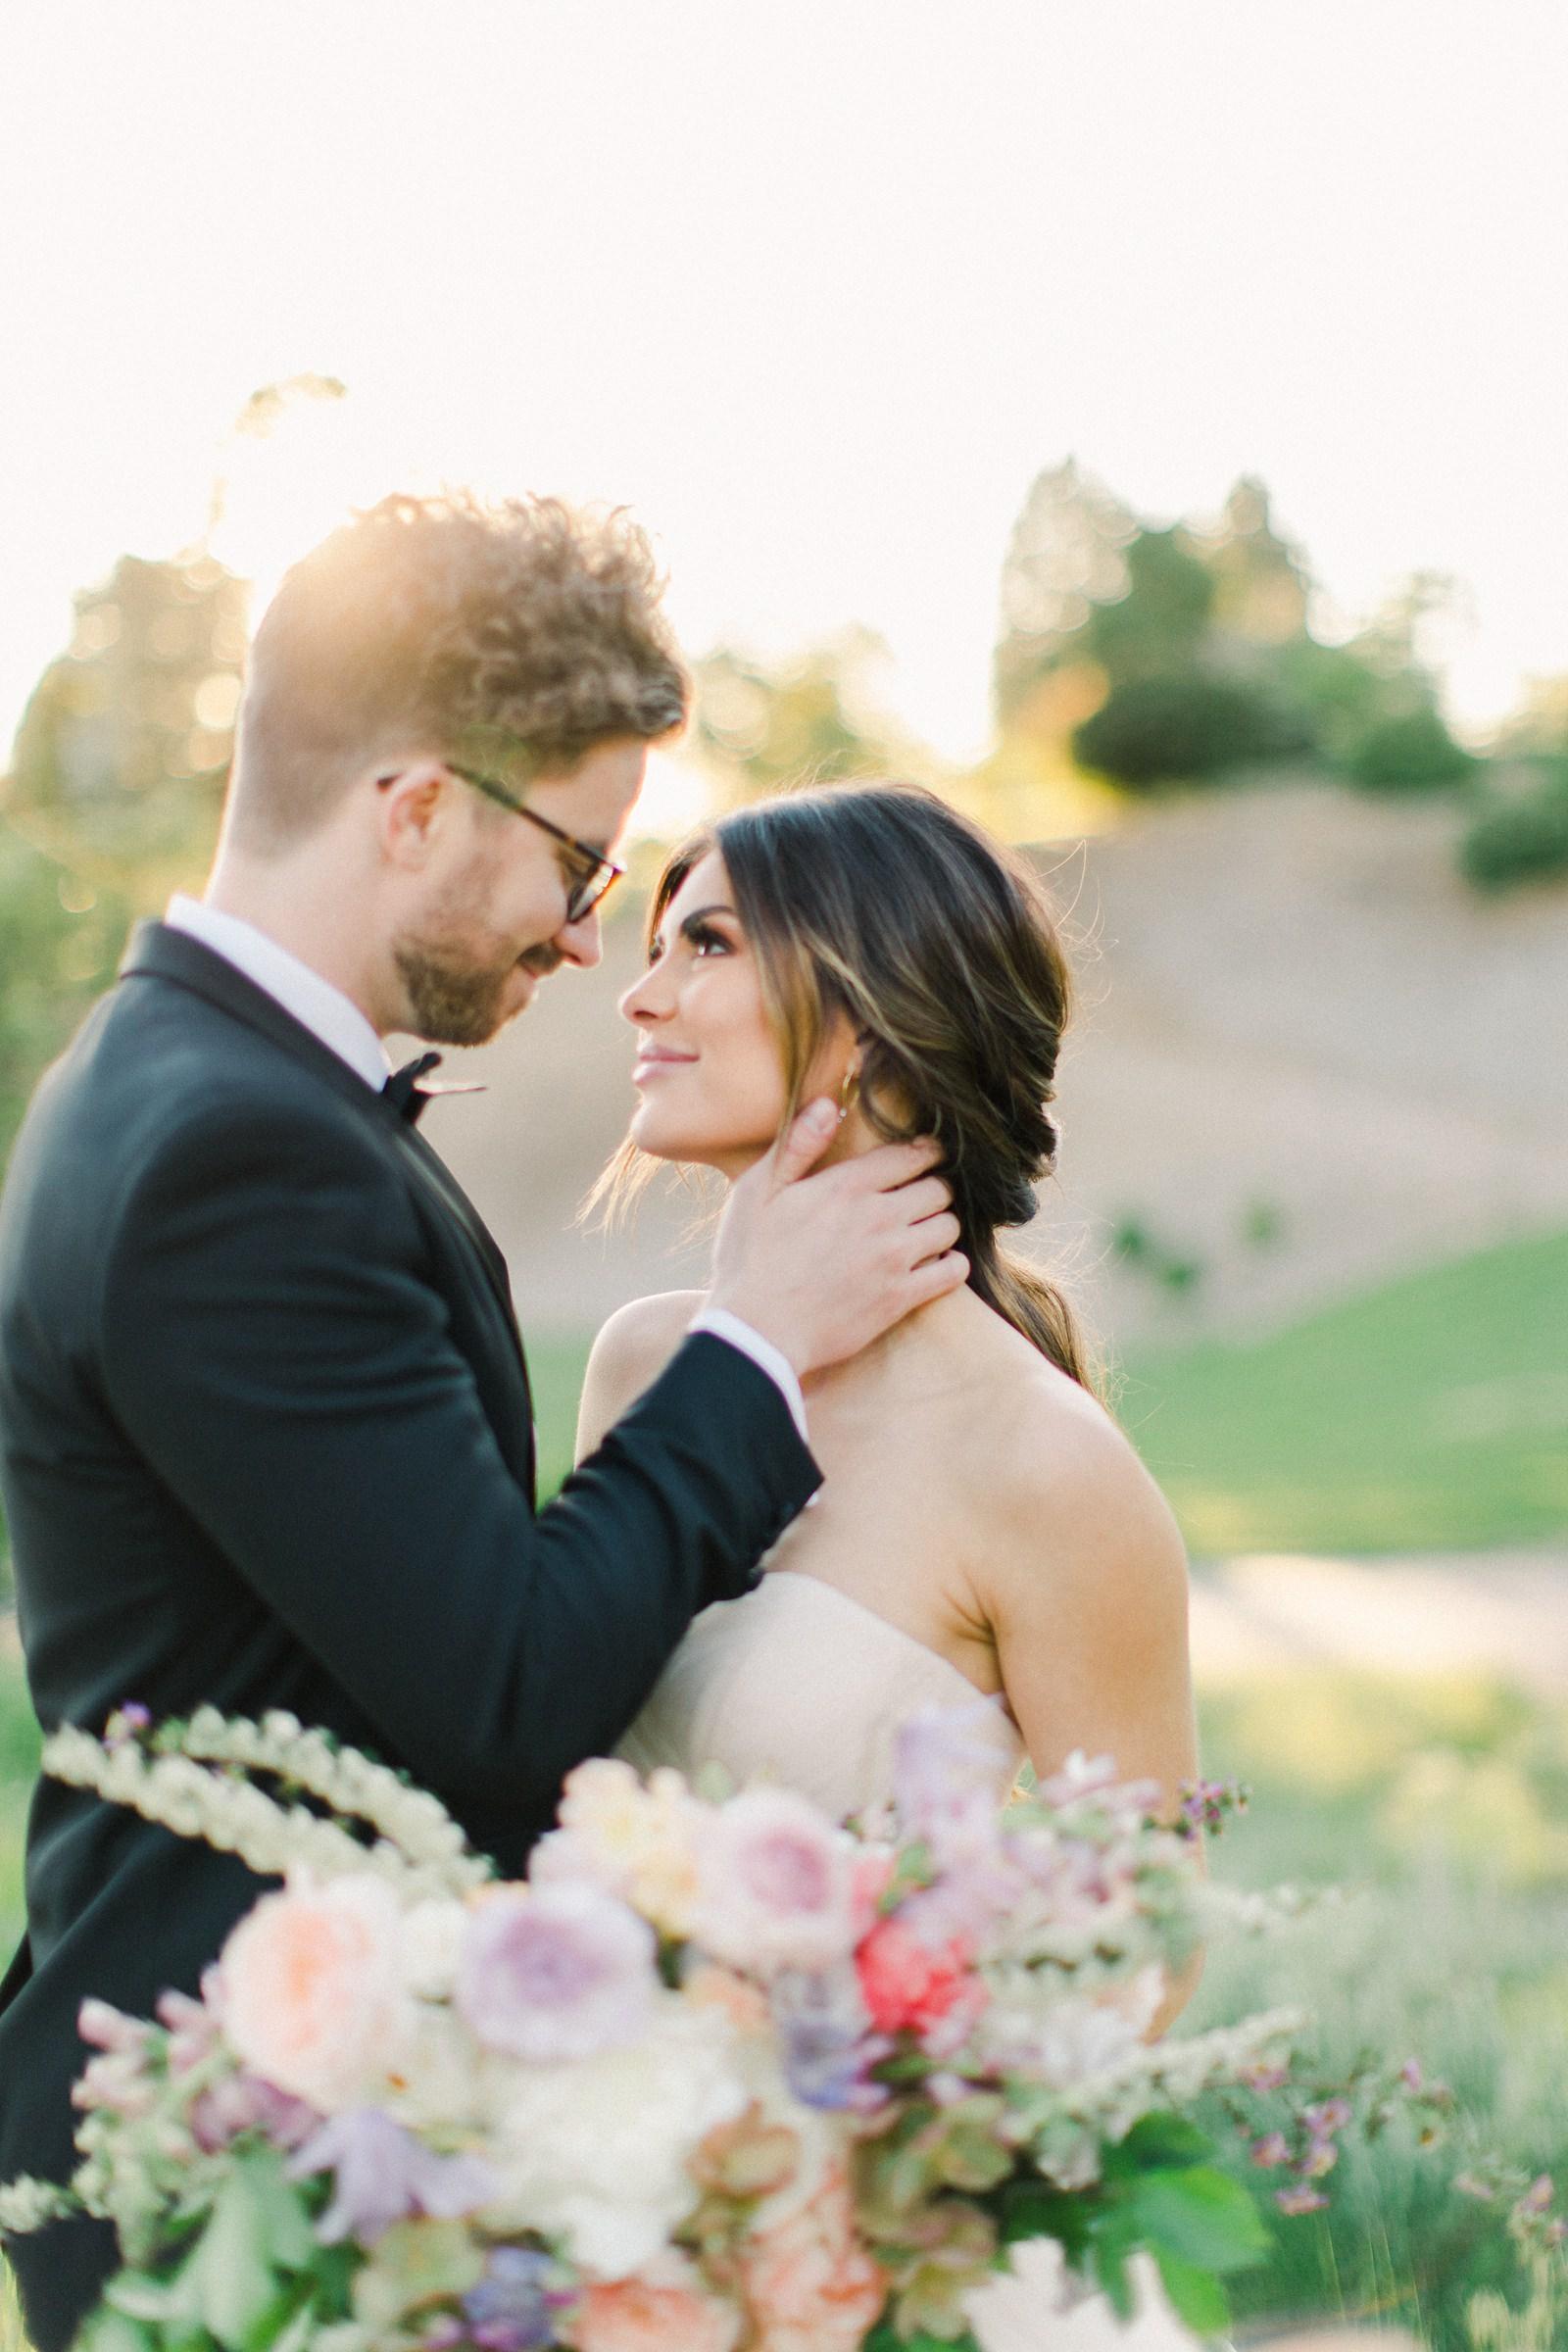 Outdoor Spring Secret Garden Wedding, Provo Utah Film Wedding Photography, pastel wildflower bouquet purple wedding flowers, bride and groom golden hour sunset light